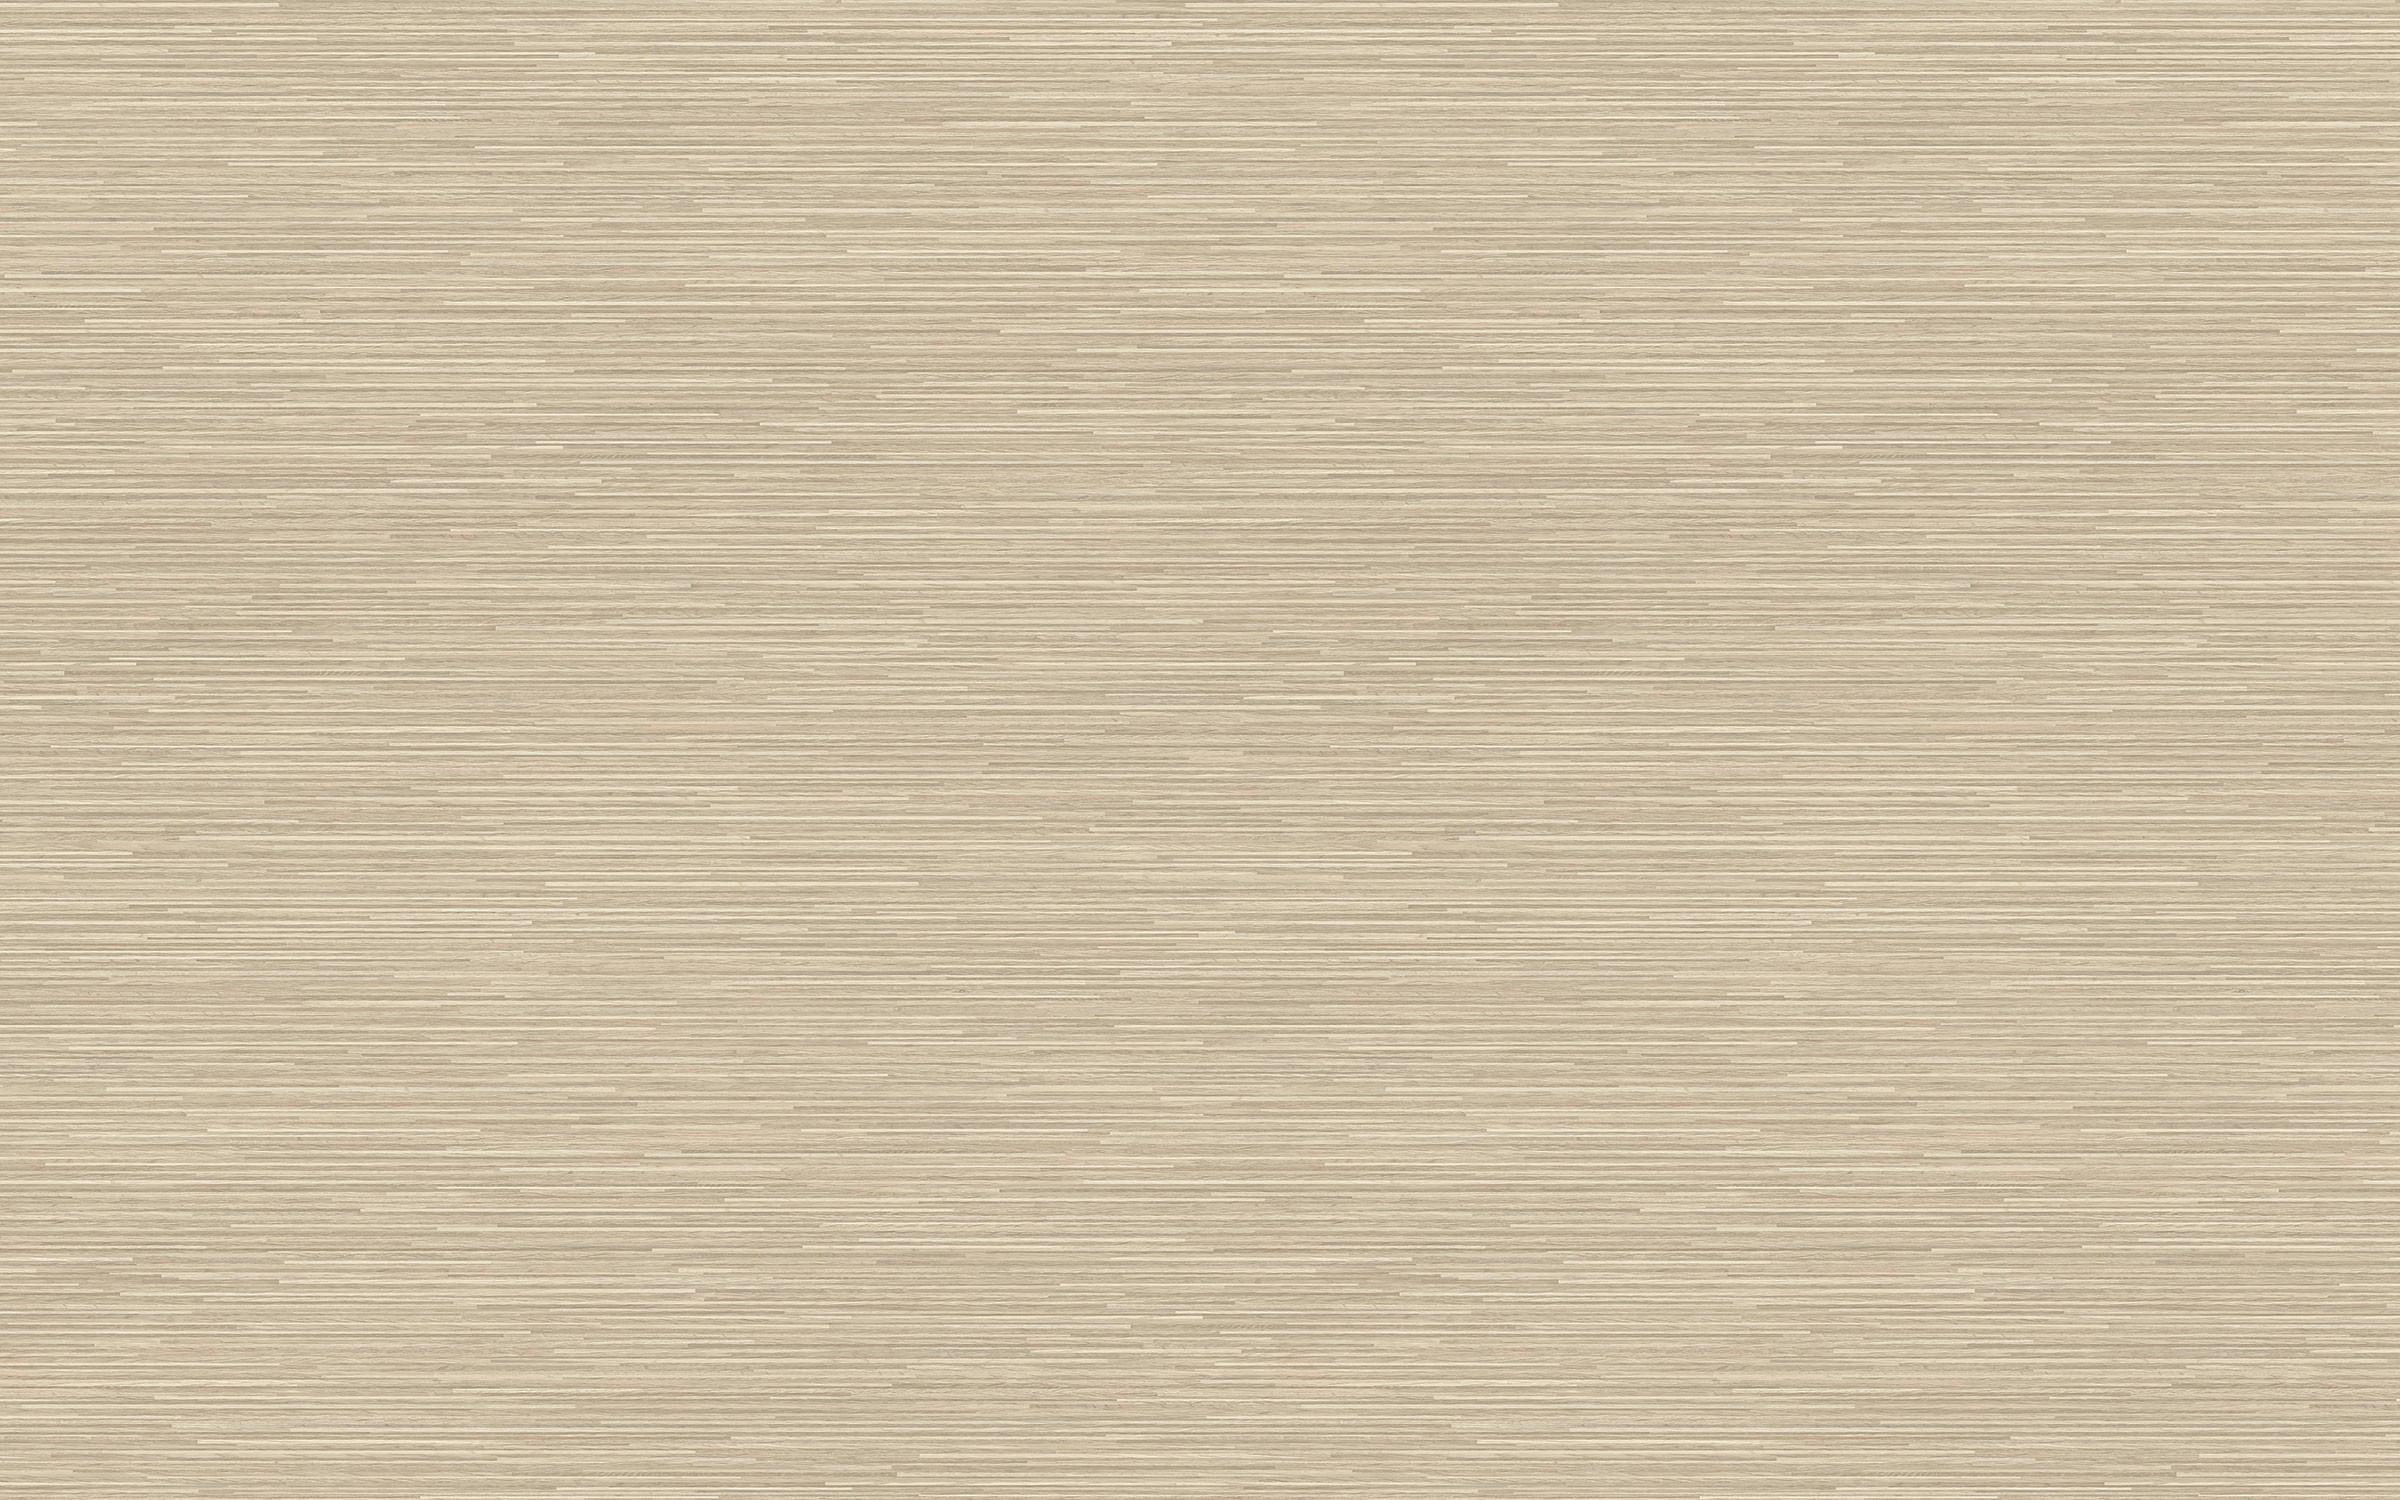 8202k Light Oak Ply Laminate Countertops